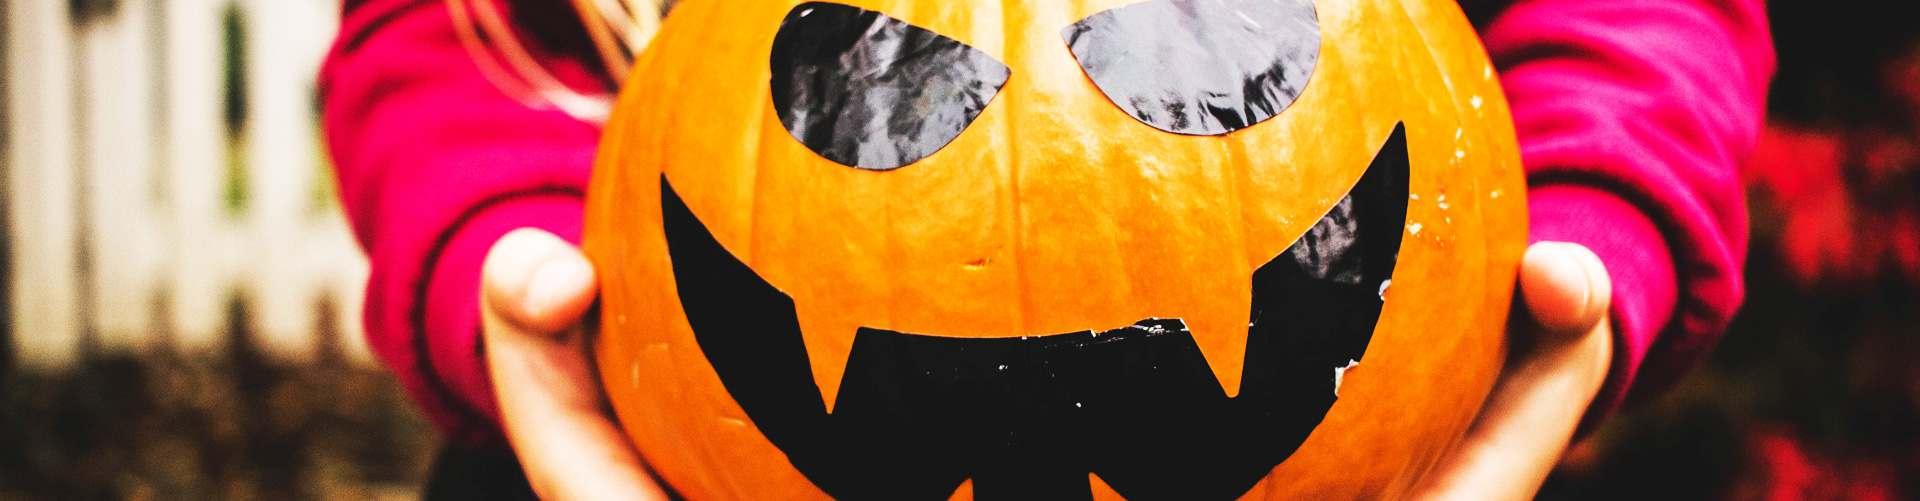 Halloween Utrecht 31 Oktober.De Beste Halloween Festivals In Nederland Datumprikker Nl